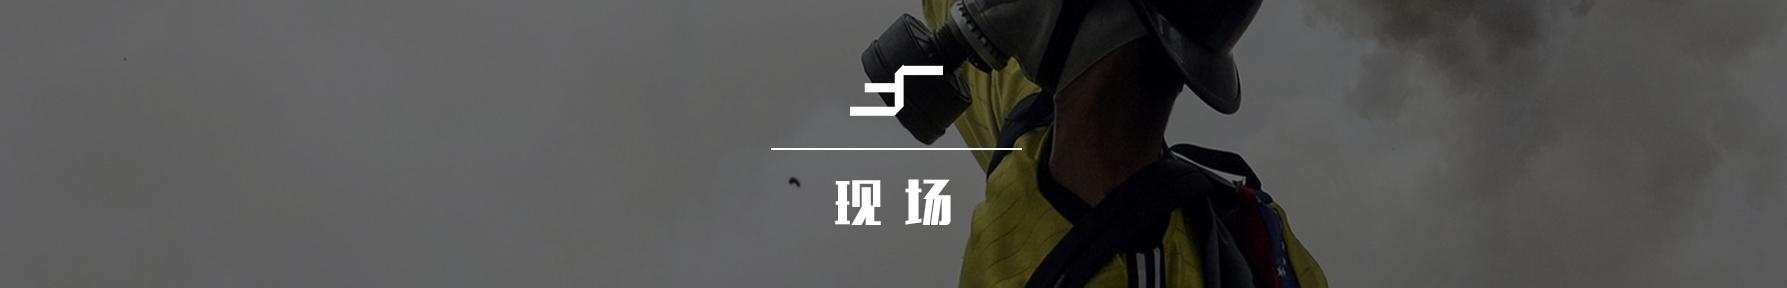 导向新闻网 banner